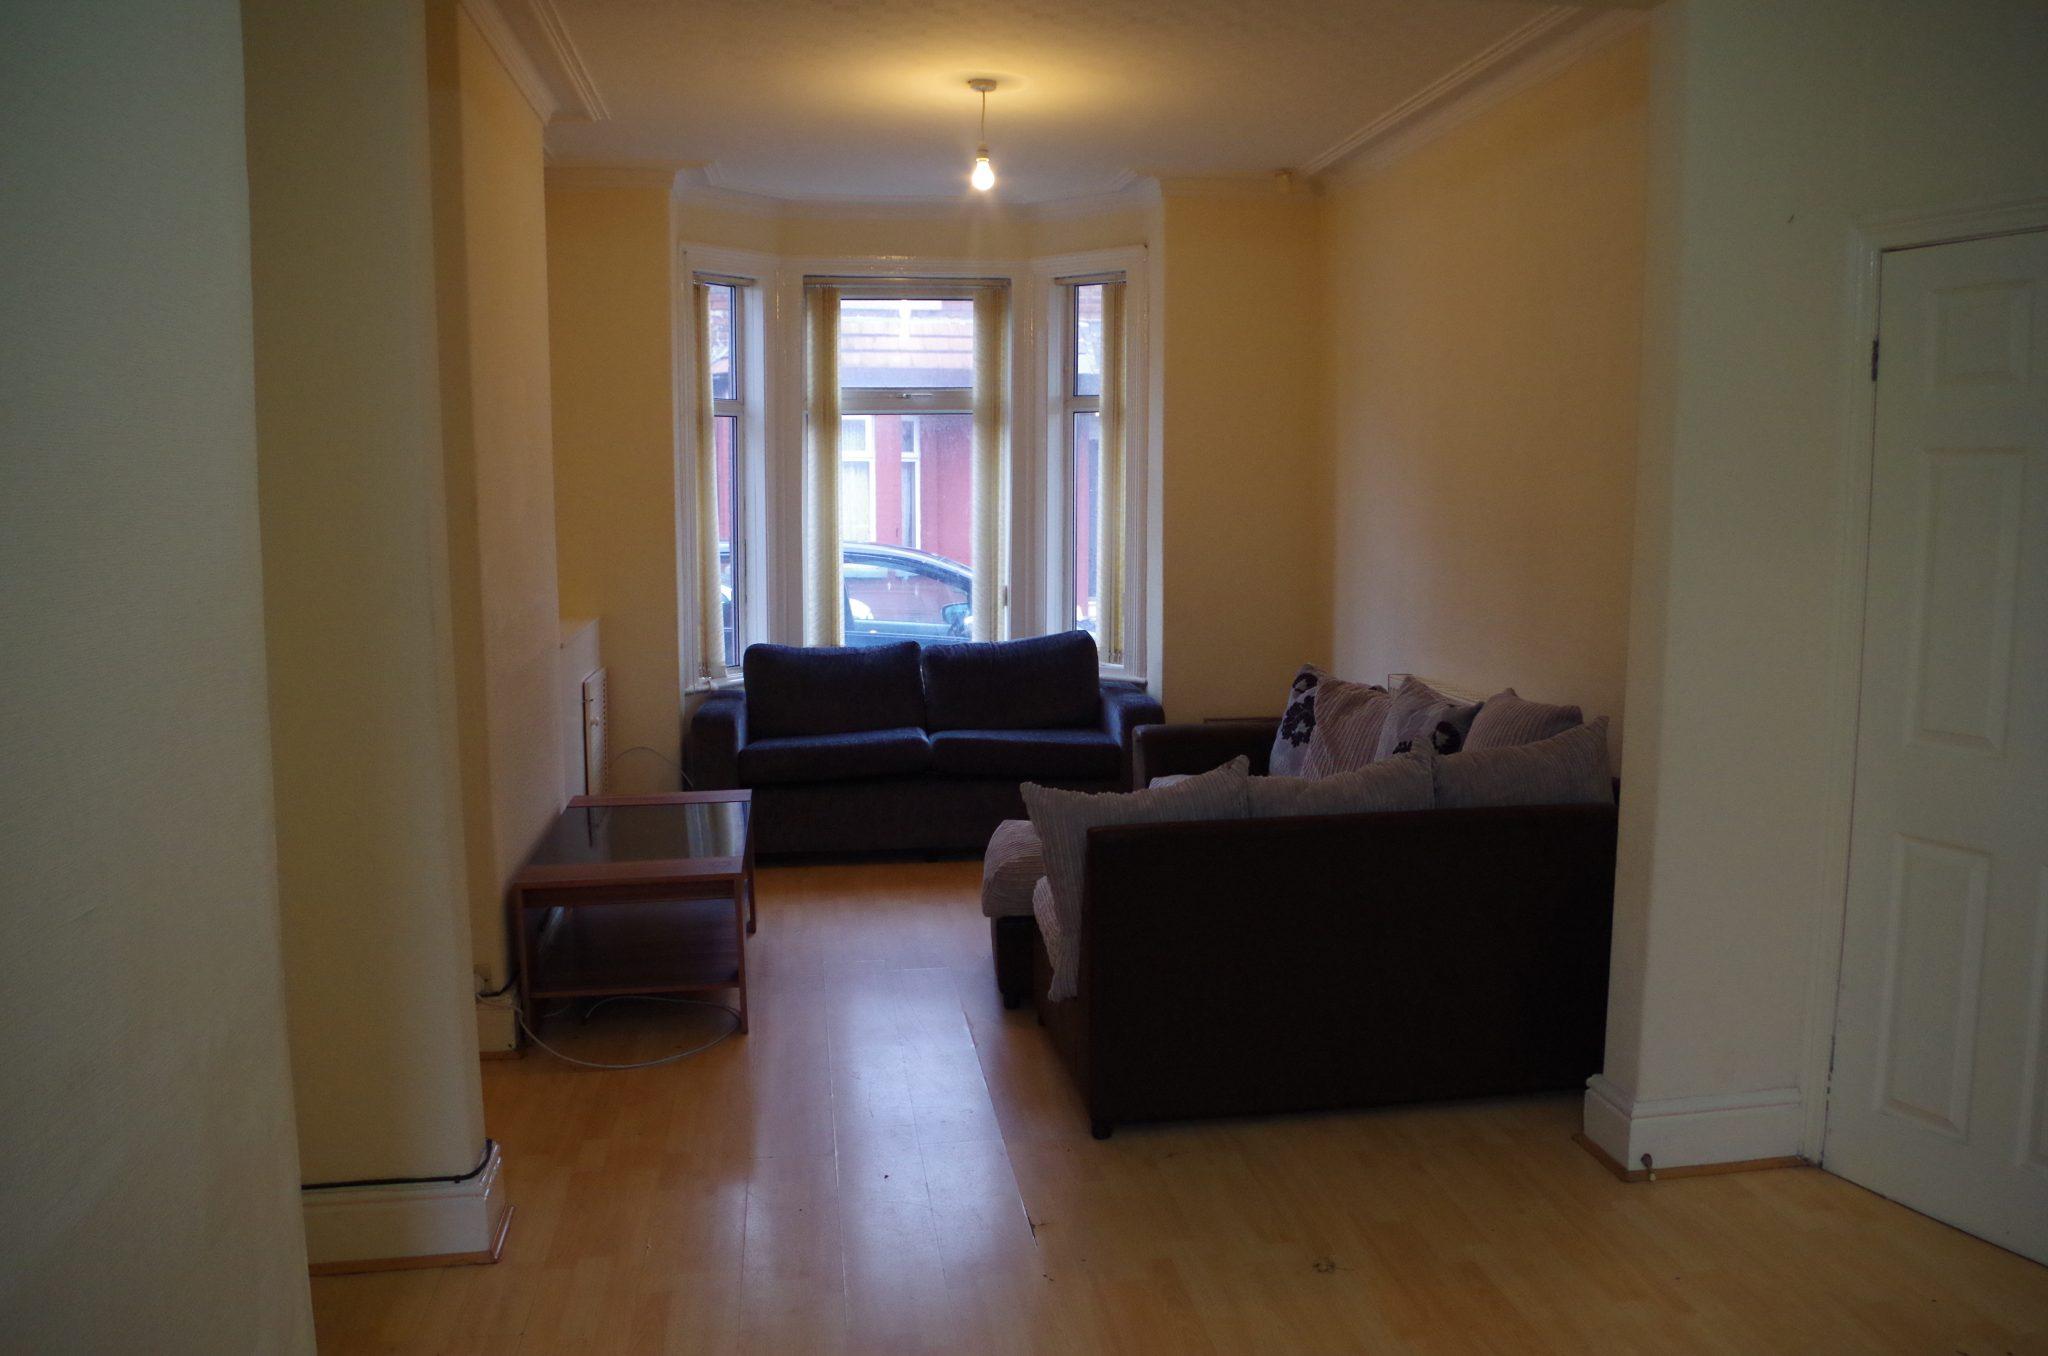 Residential Property | 56 Mildred Street, Salford, M7 2HG